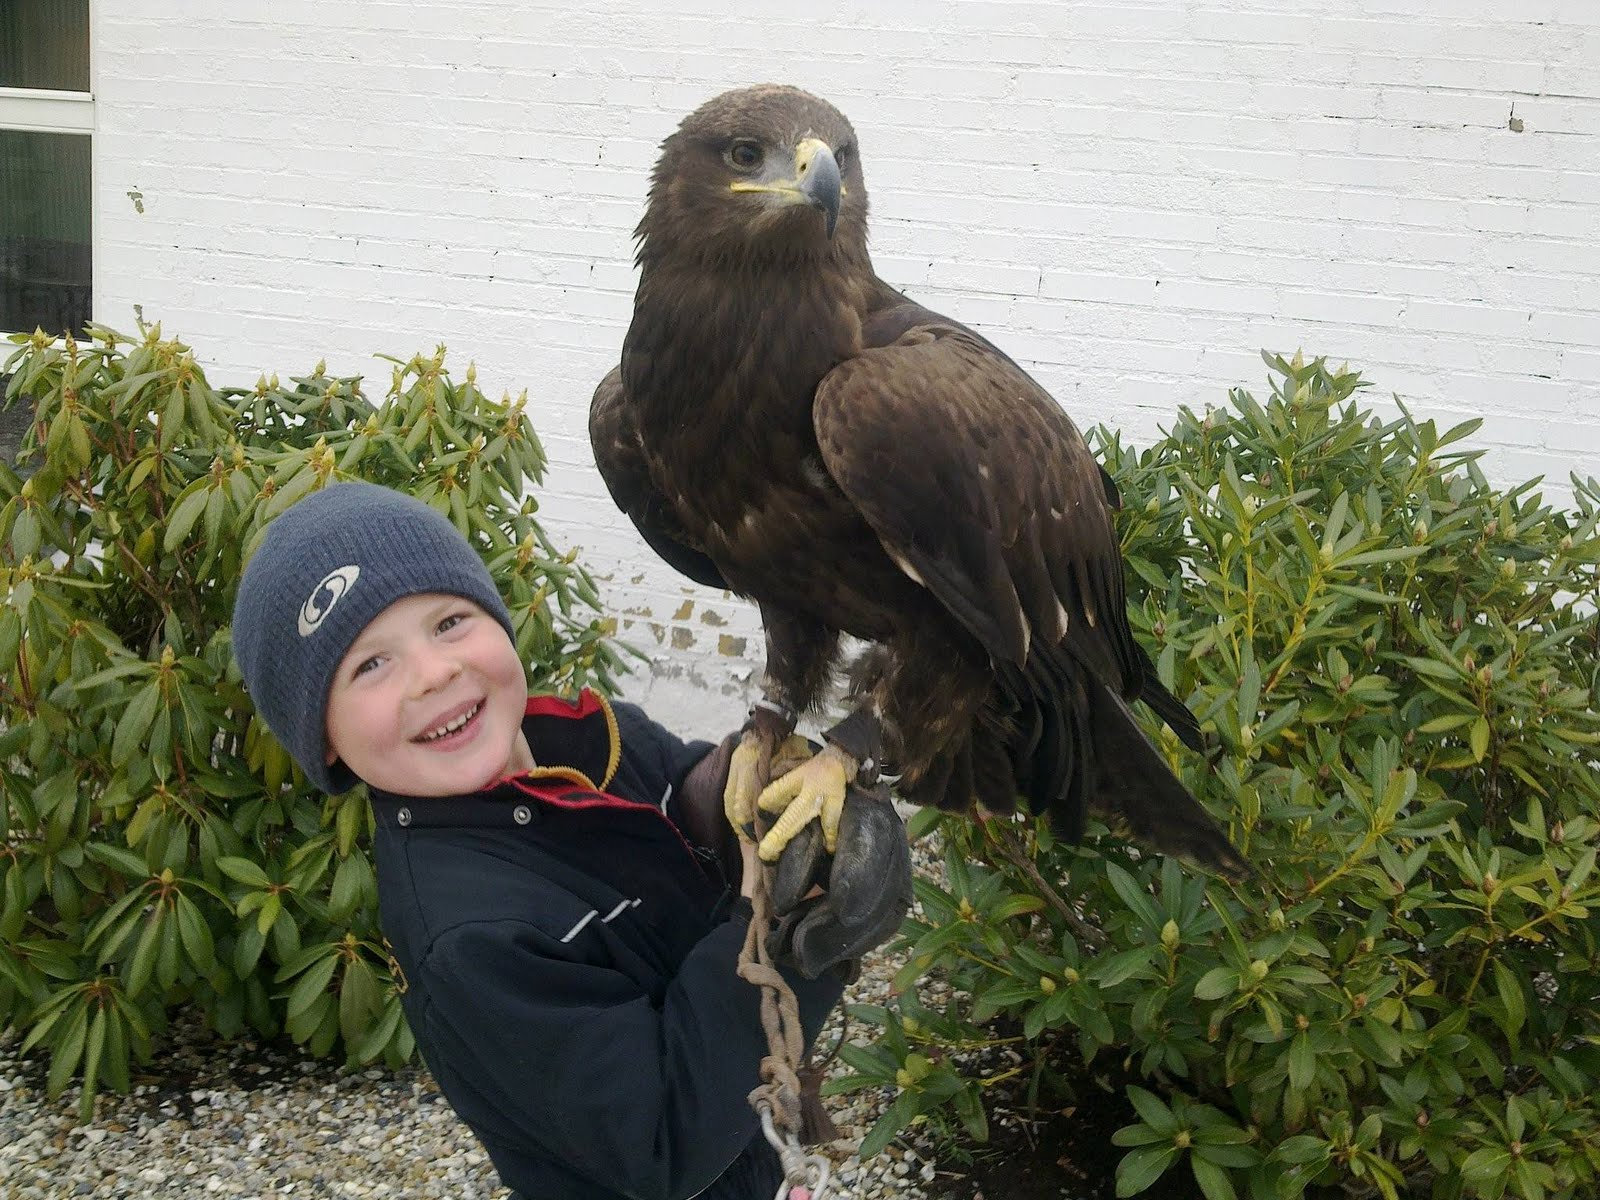 Giant golden eagle a boy and a golden eagle